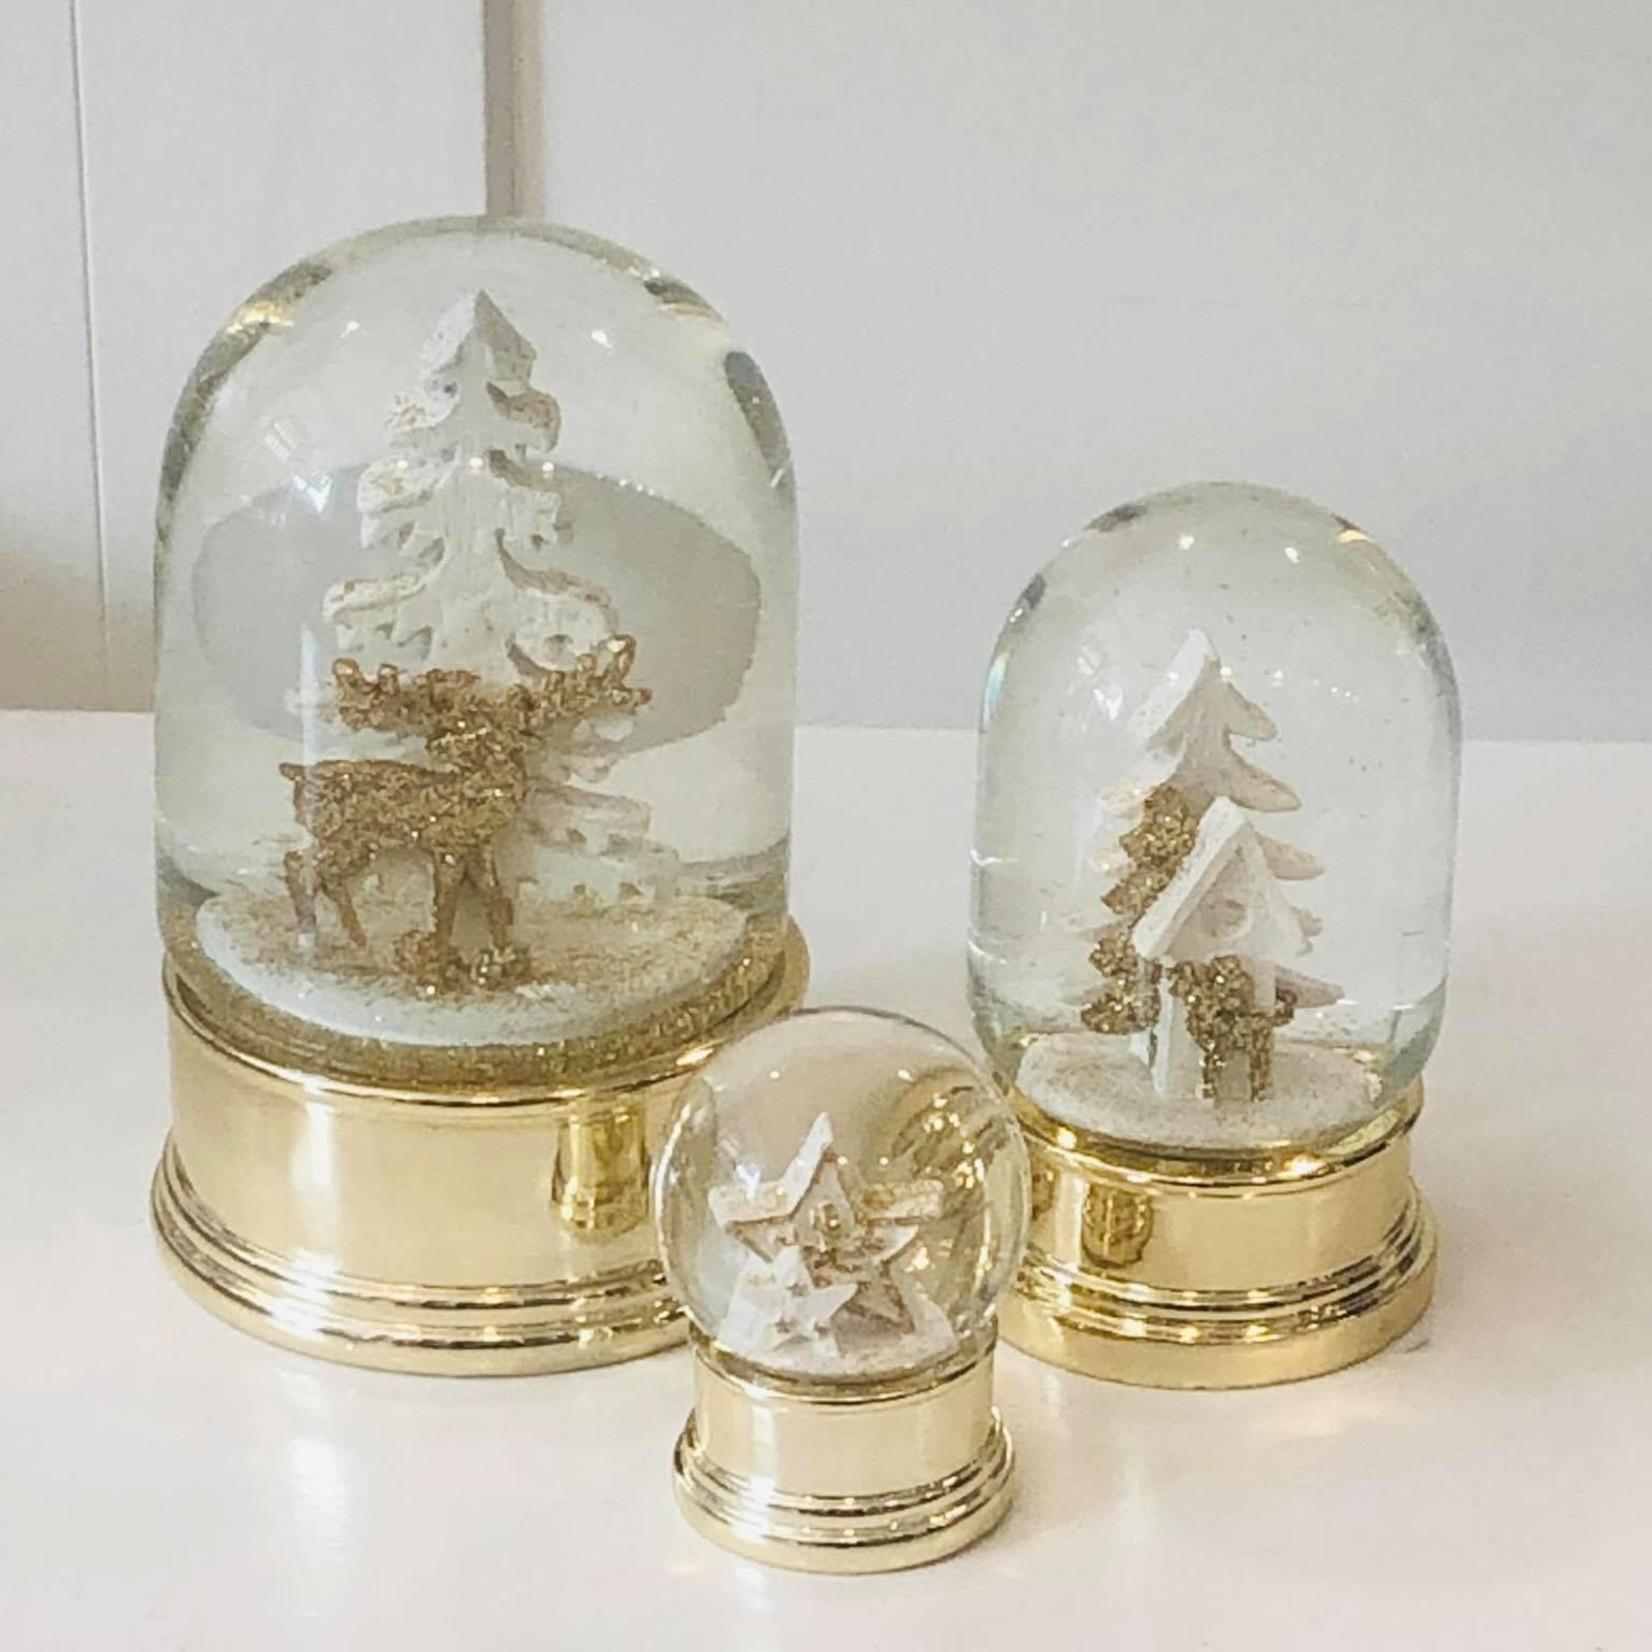 Kleine gouden globe met ster - Ø4,5cm  x 6cm hoog